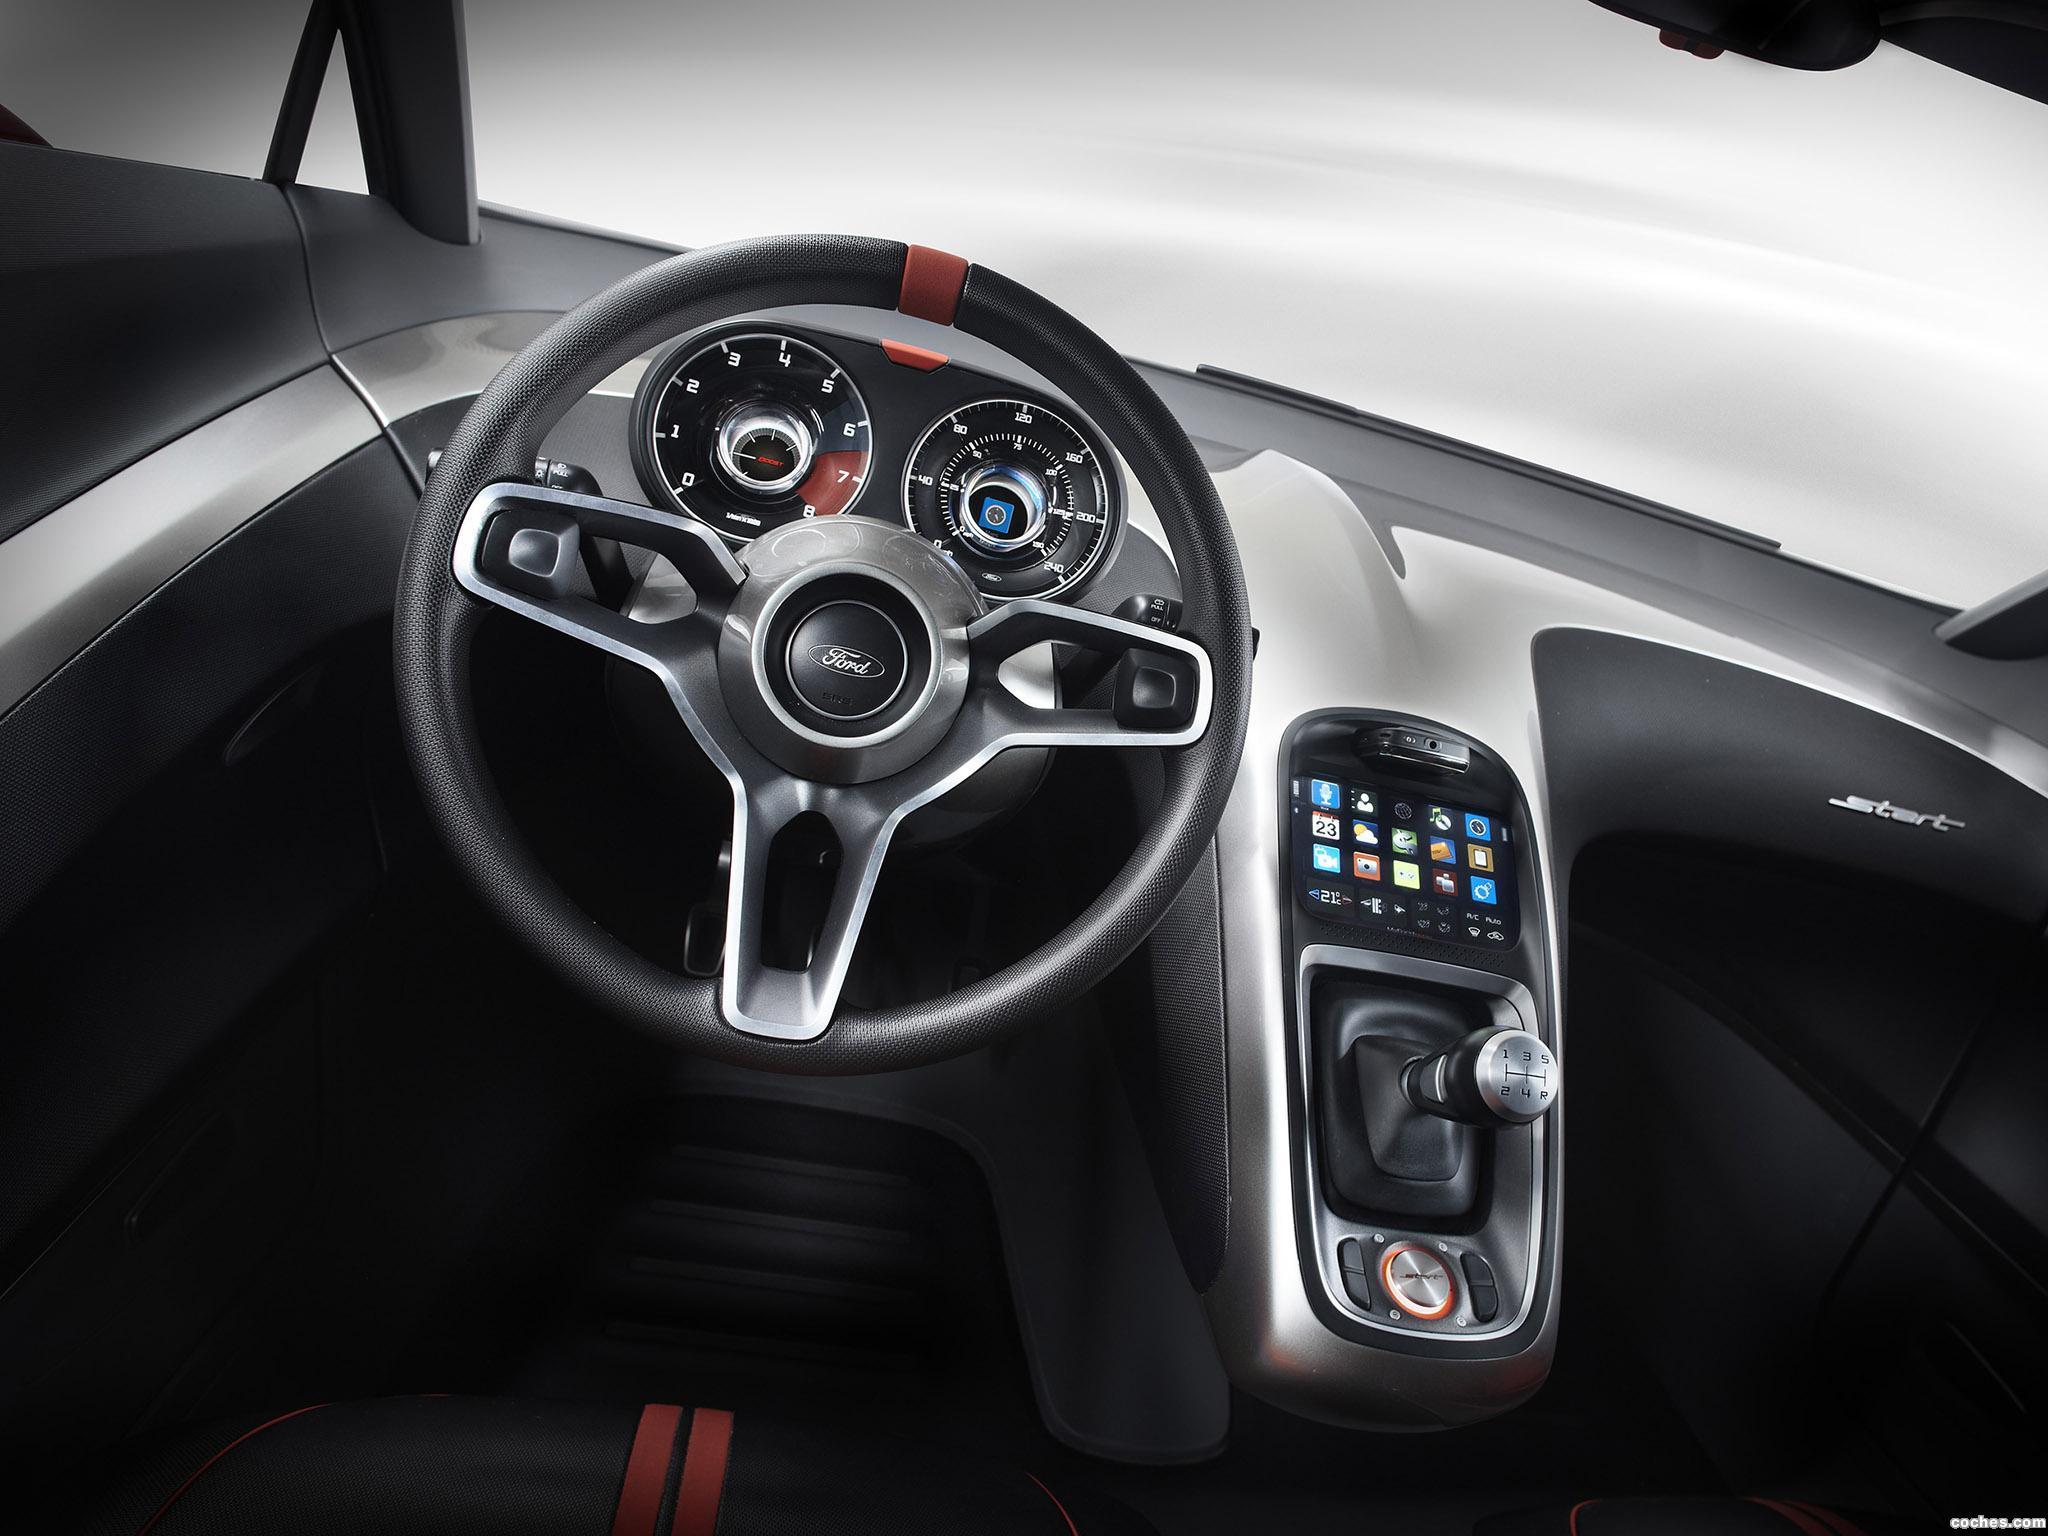 Foto 11 de Ford Start Concept 2010